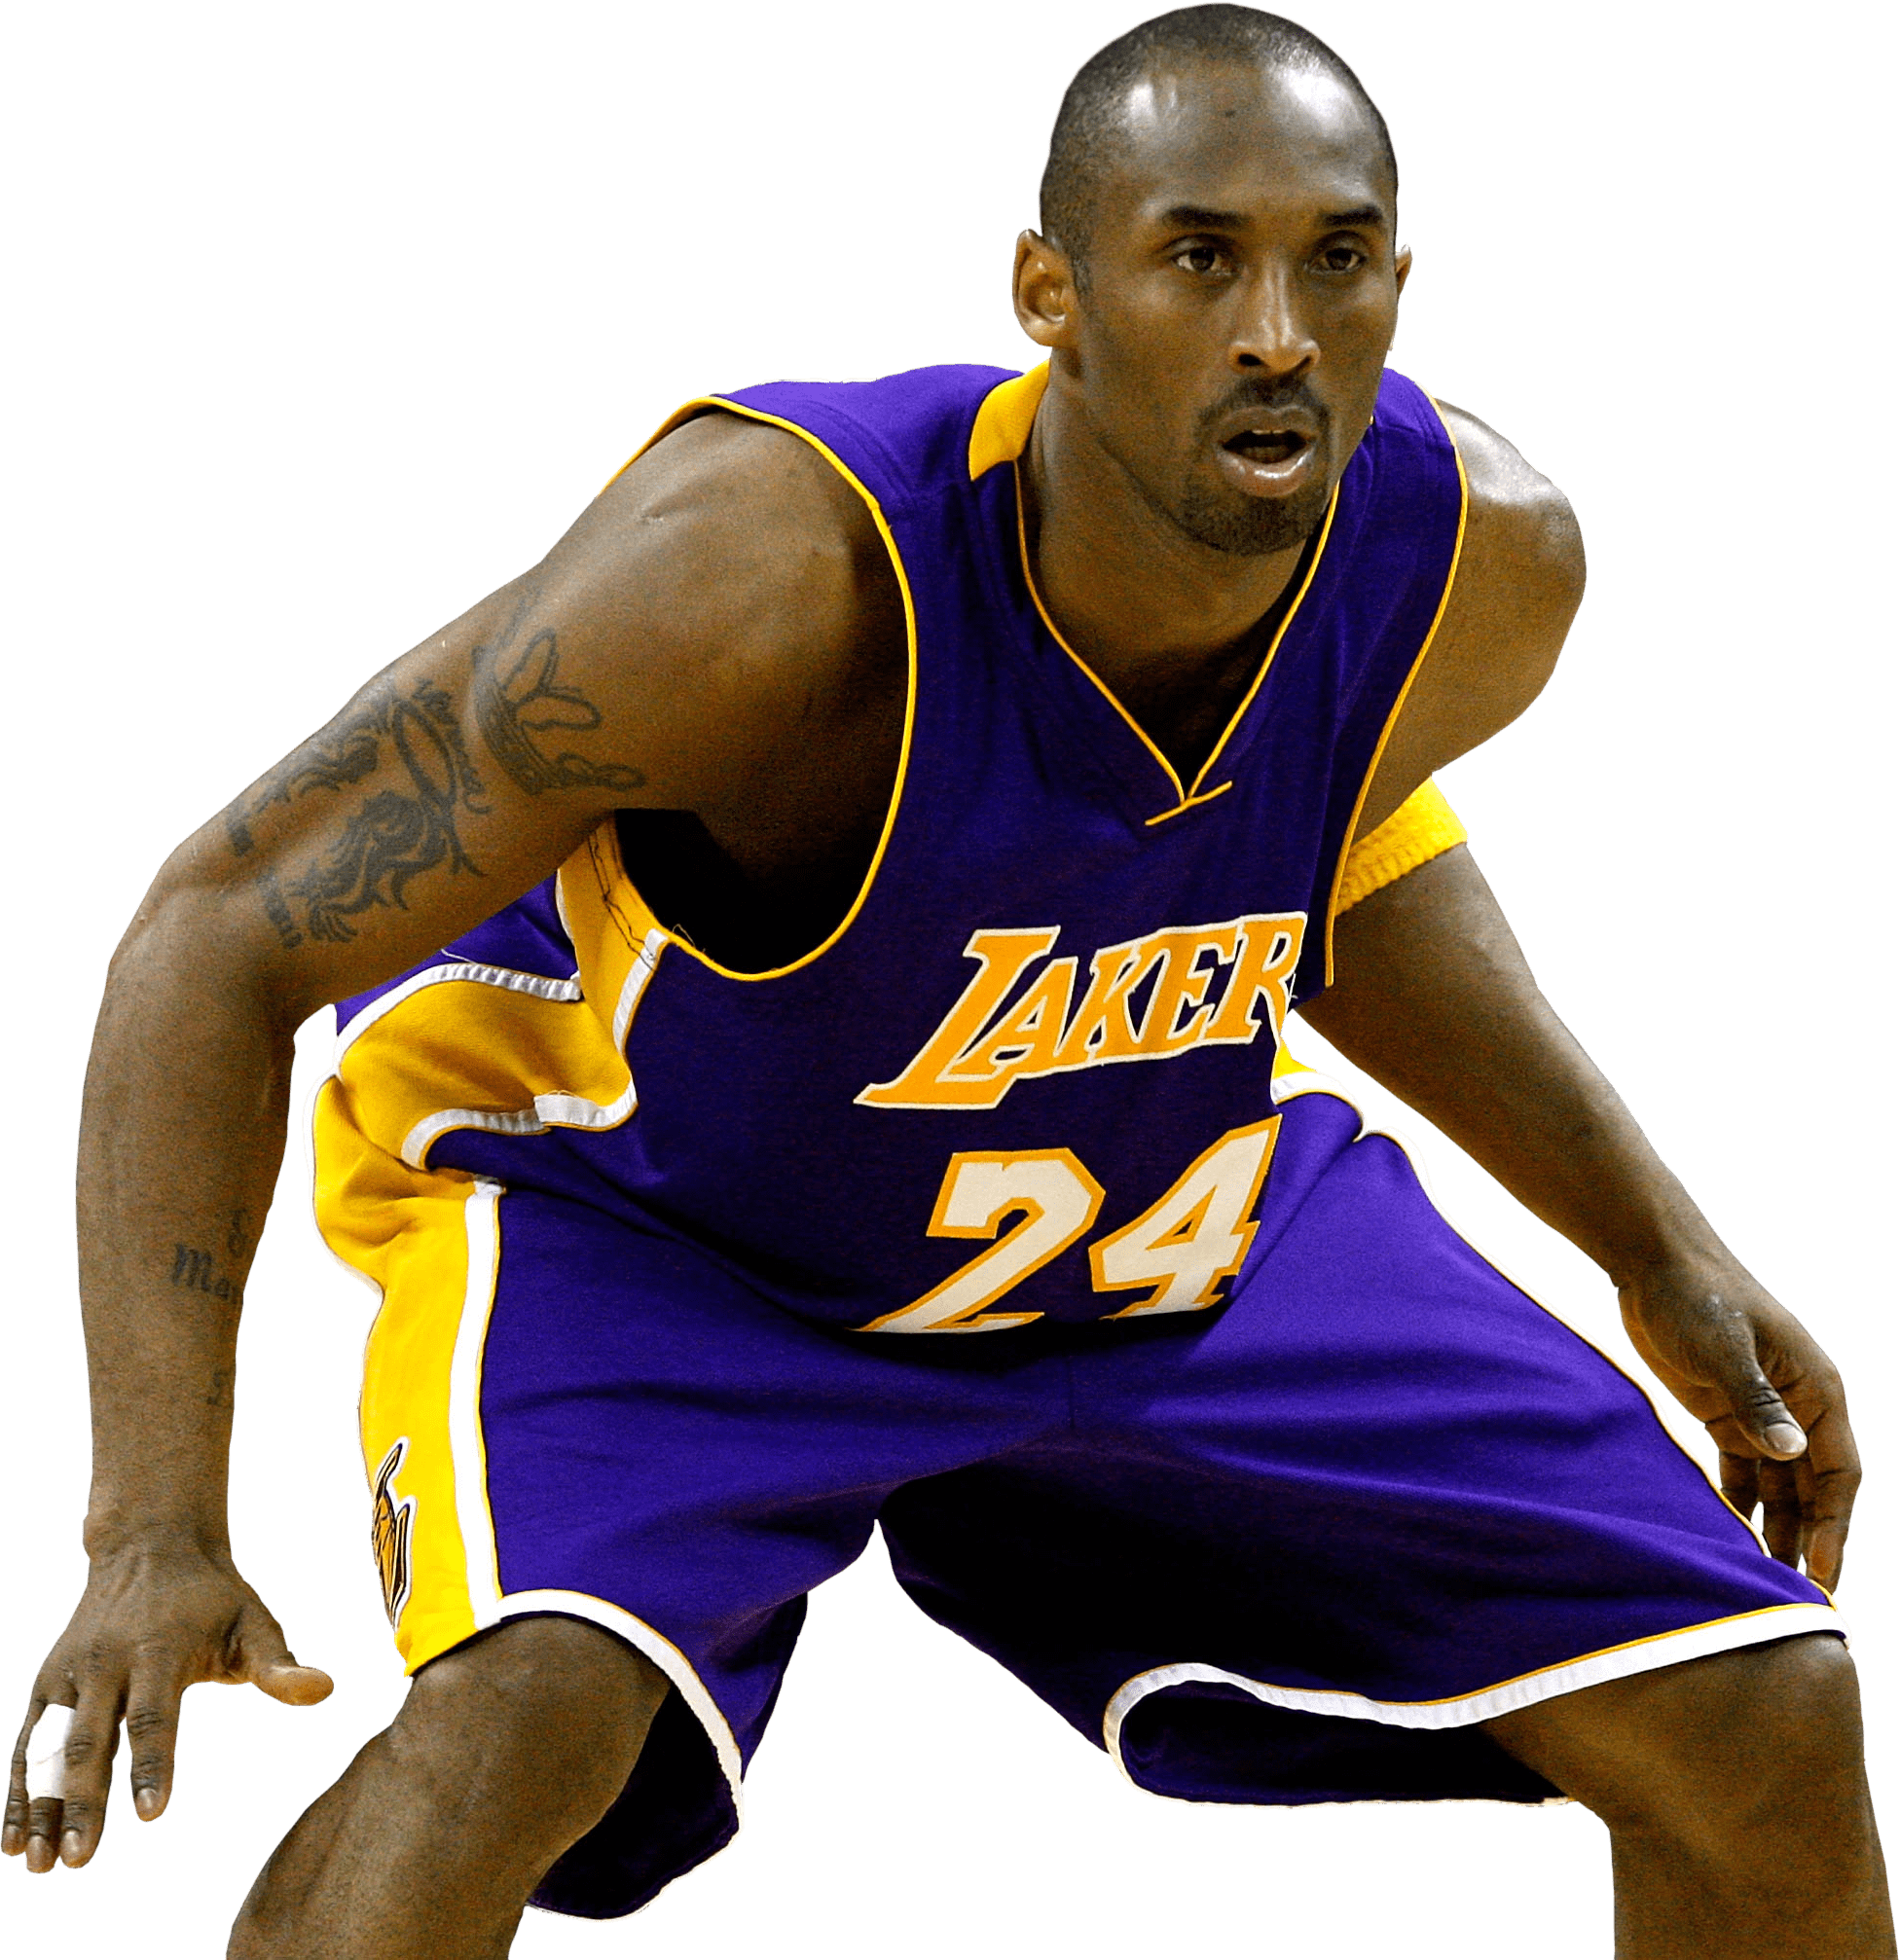 Basketball Players PNG HD - 126872